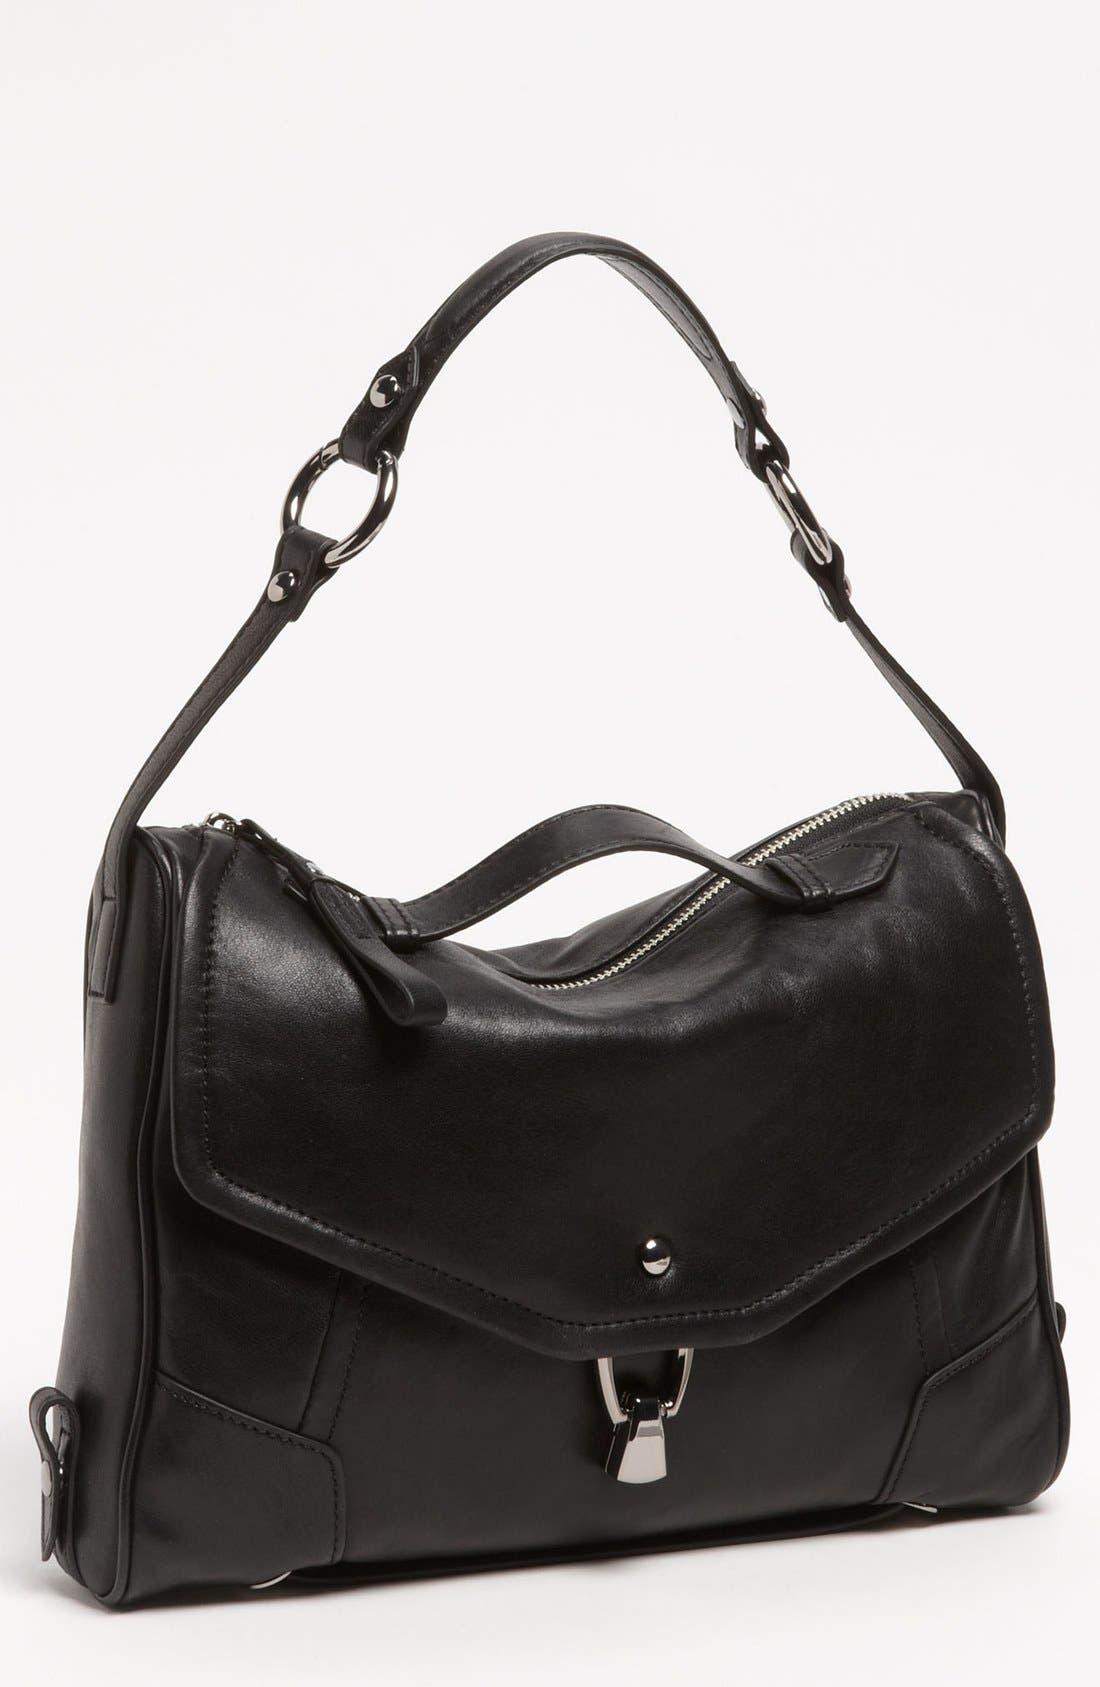 Alternate Image 1 Selected - Kooba 'Alexa' Crossbody Bag